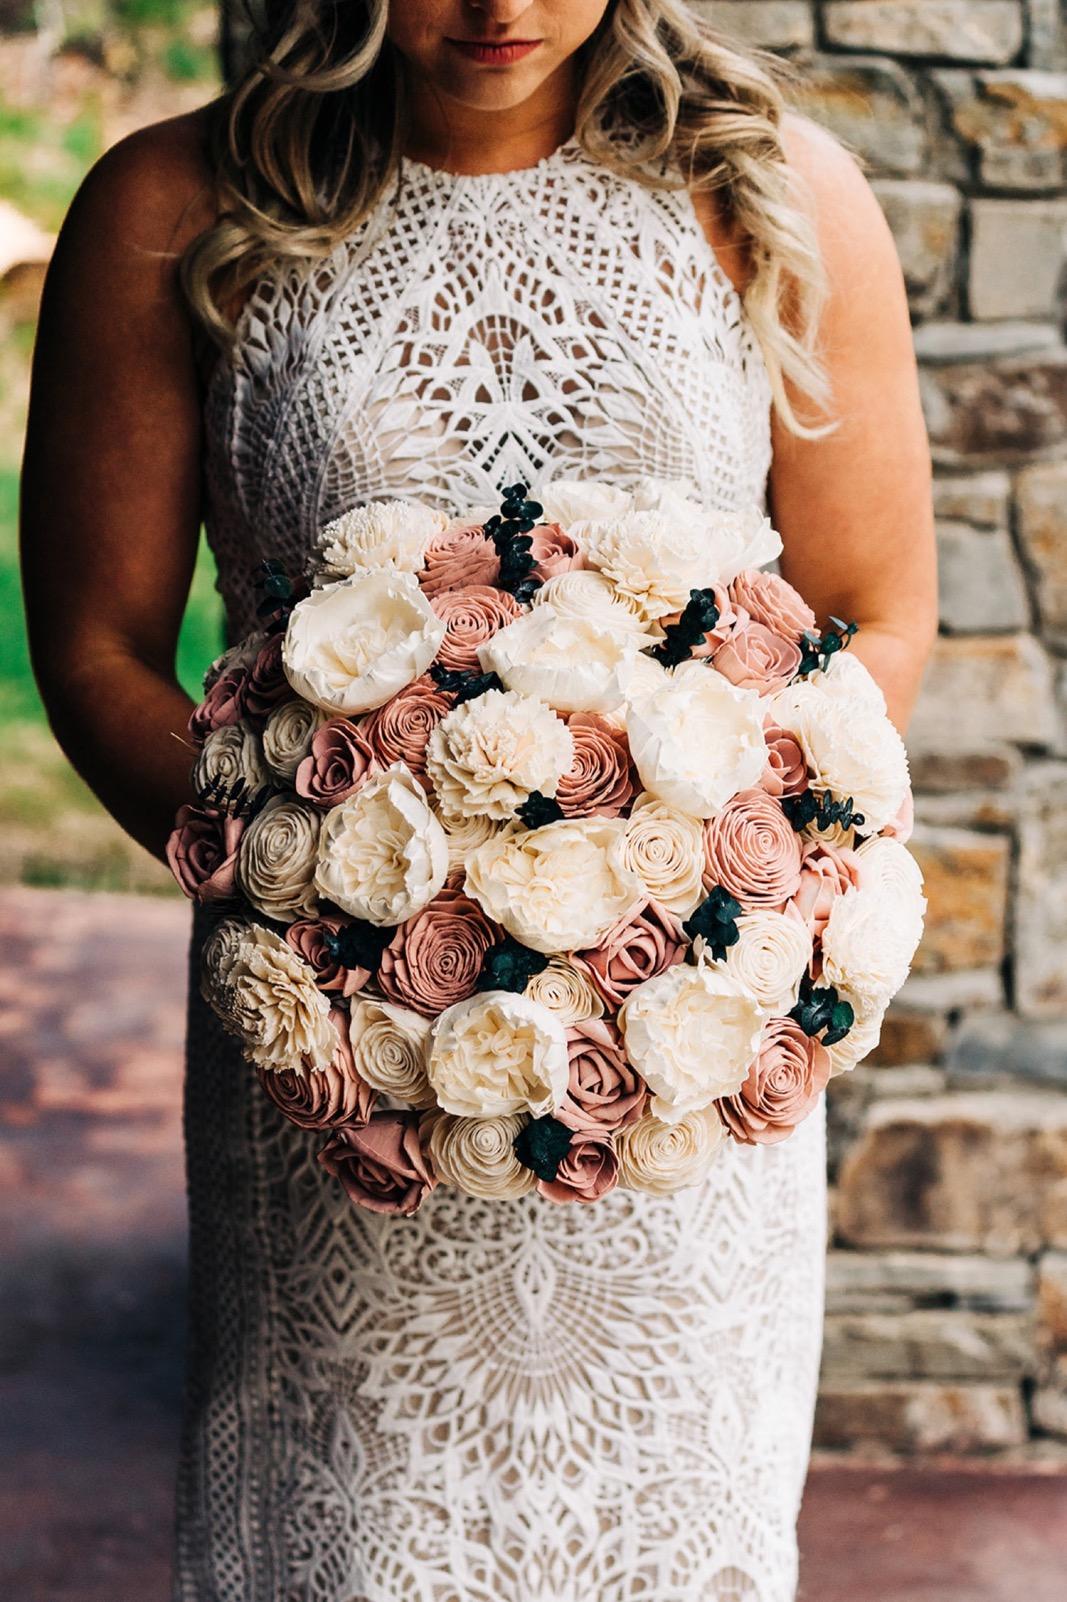 029_falissa_heather_wedding-84.jpg